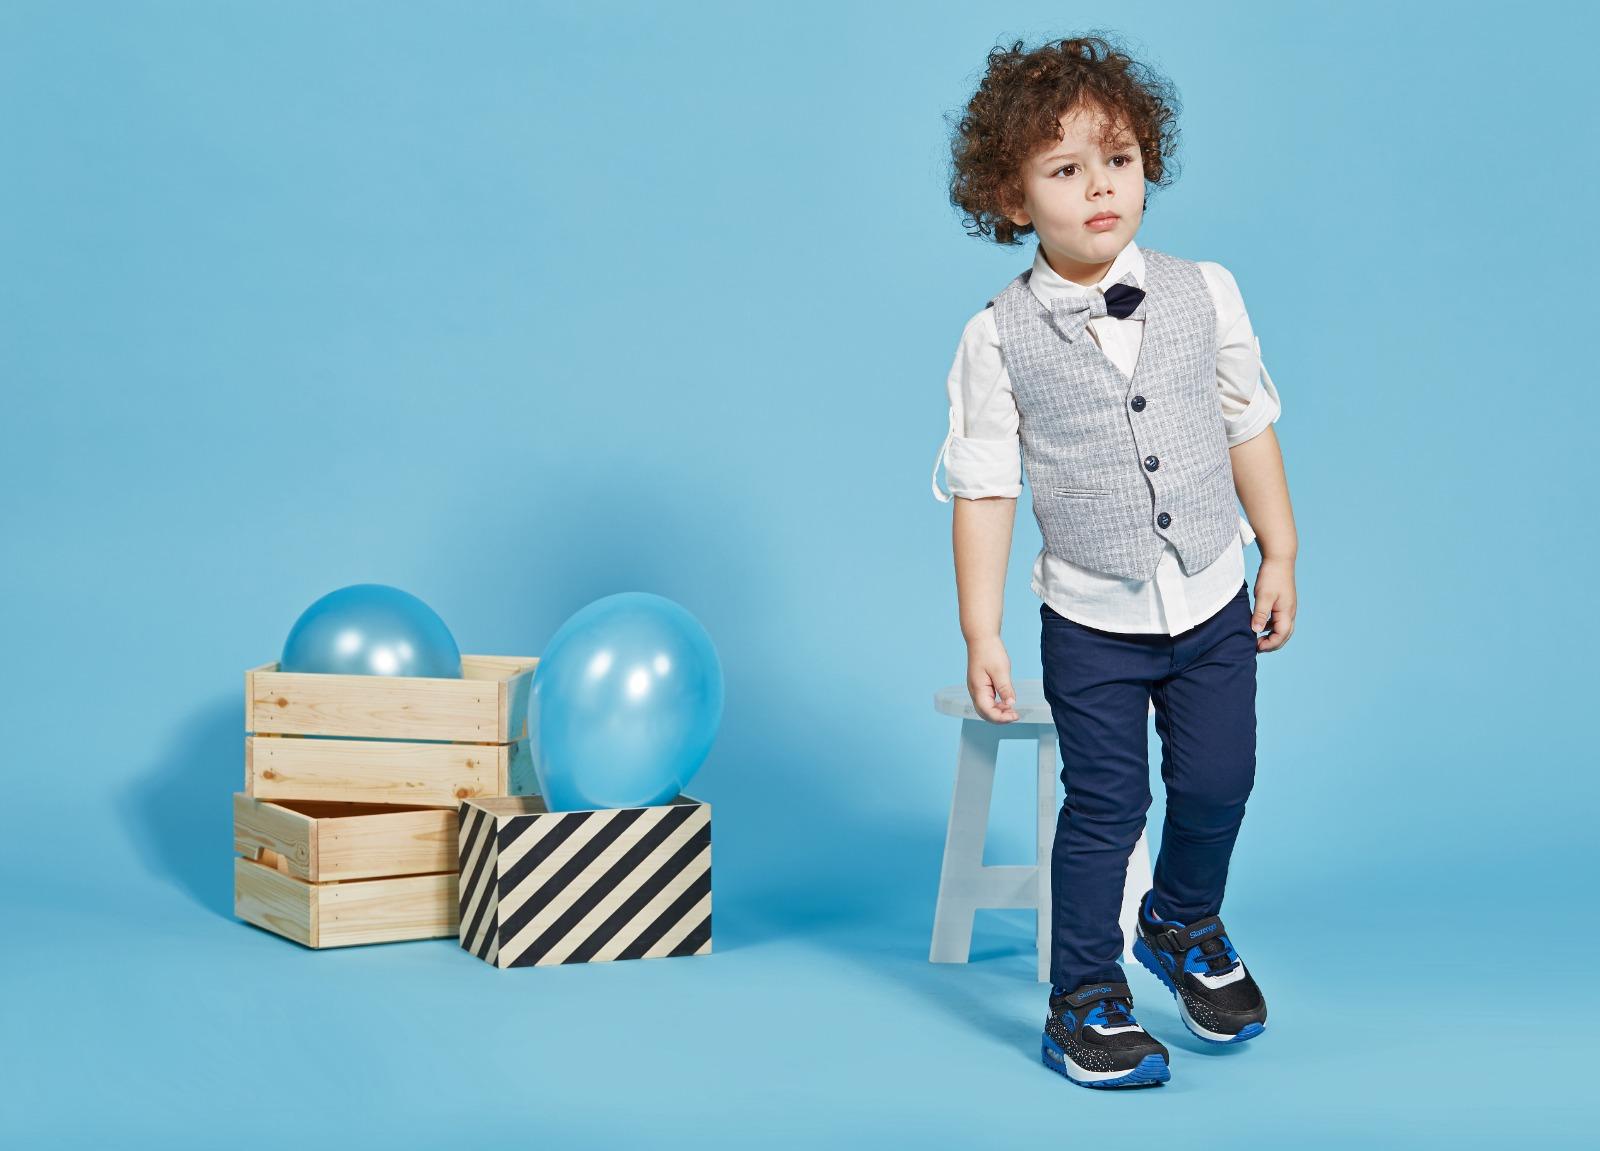 çocuk-reklam-katalog-manken